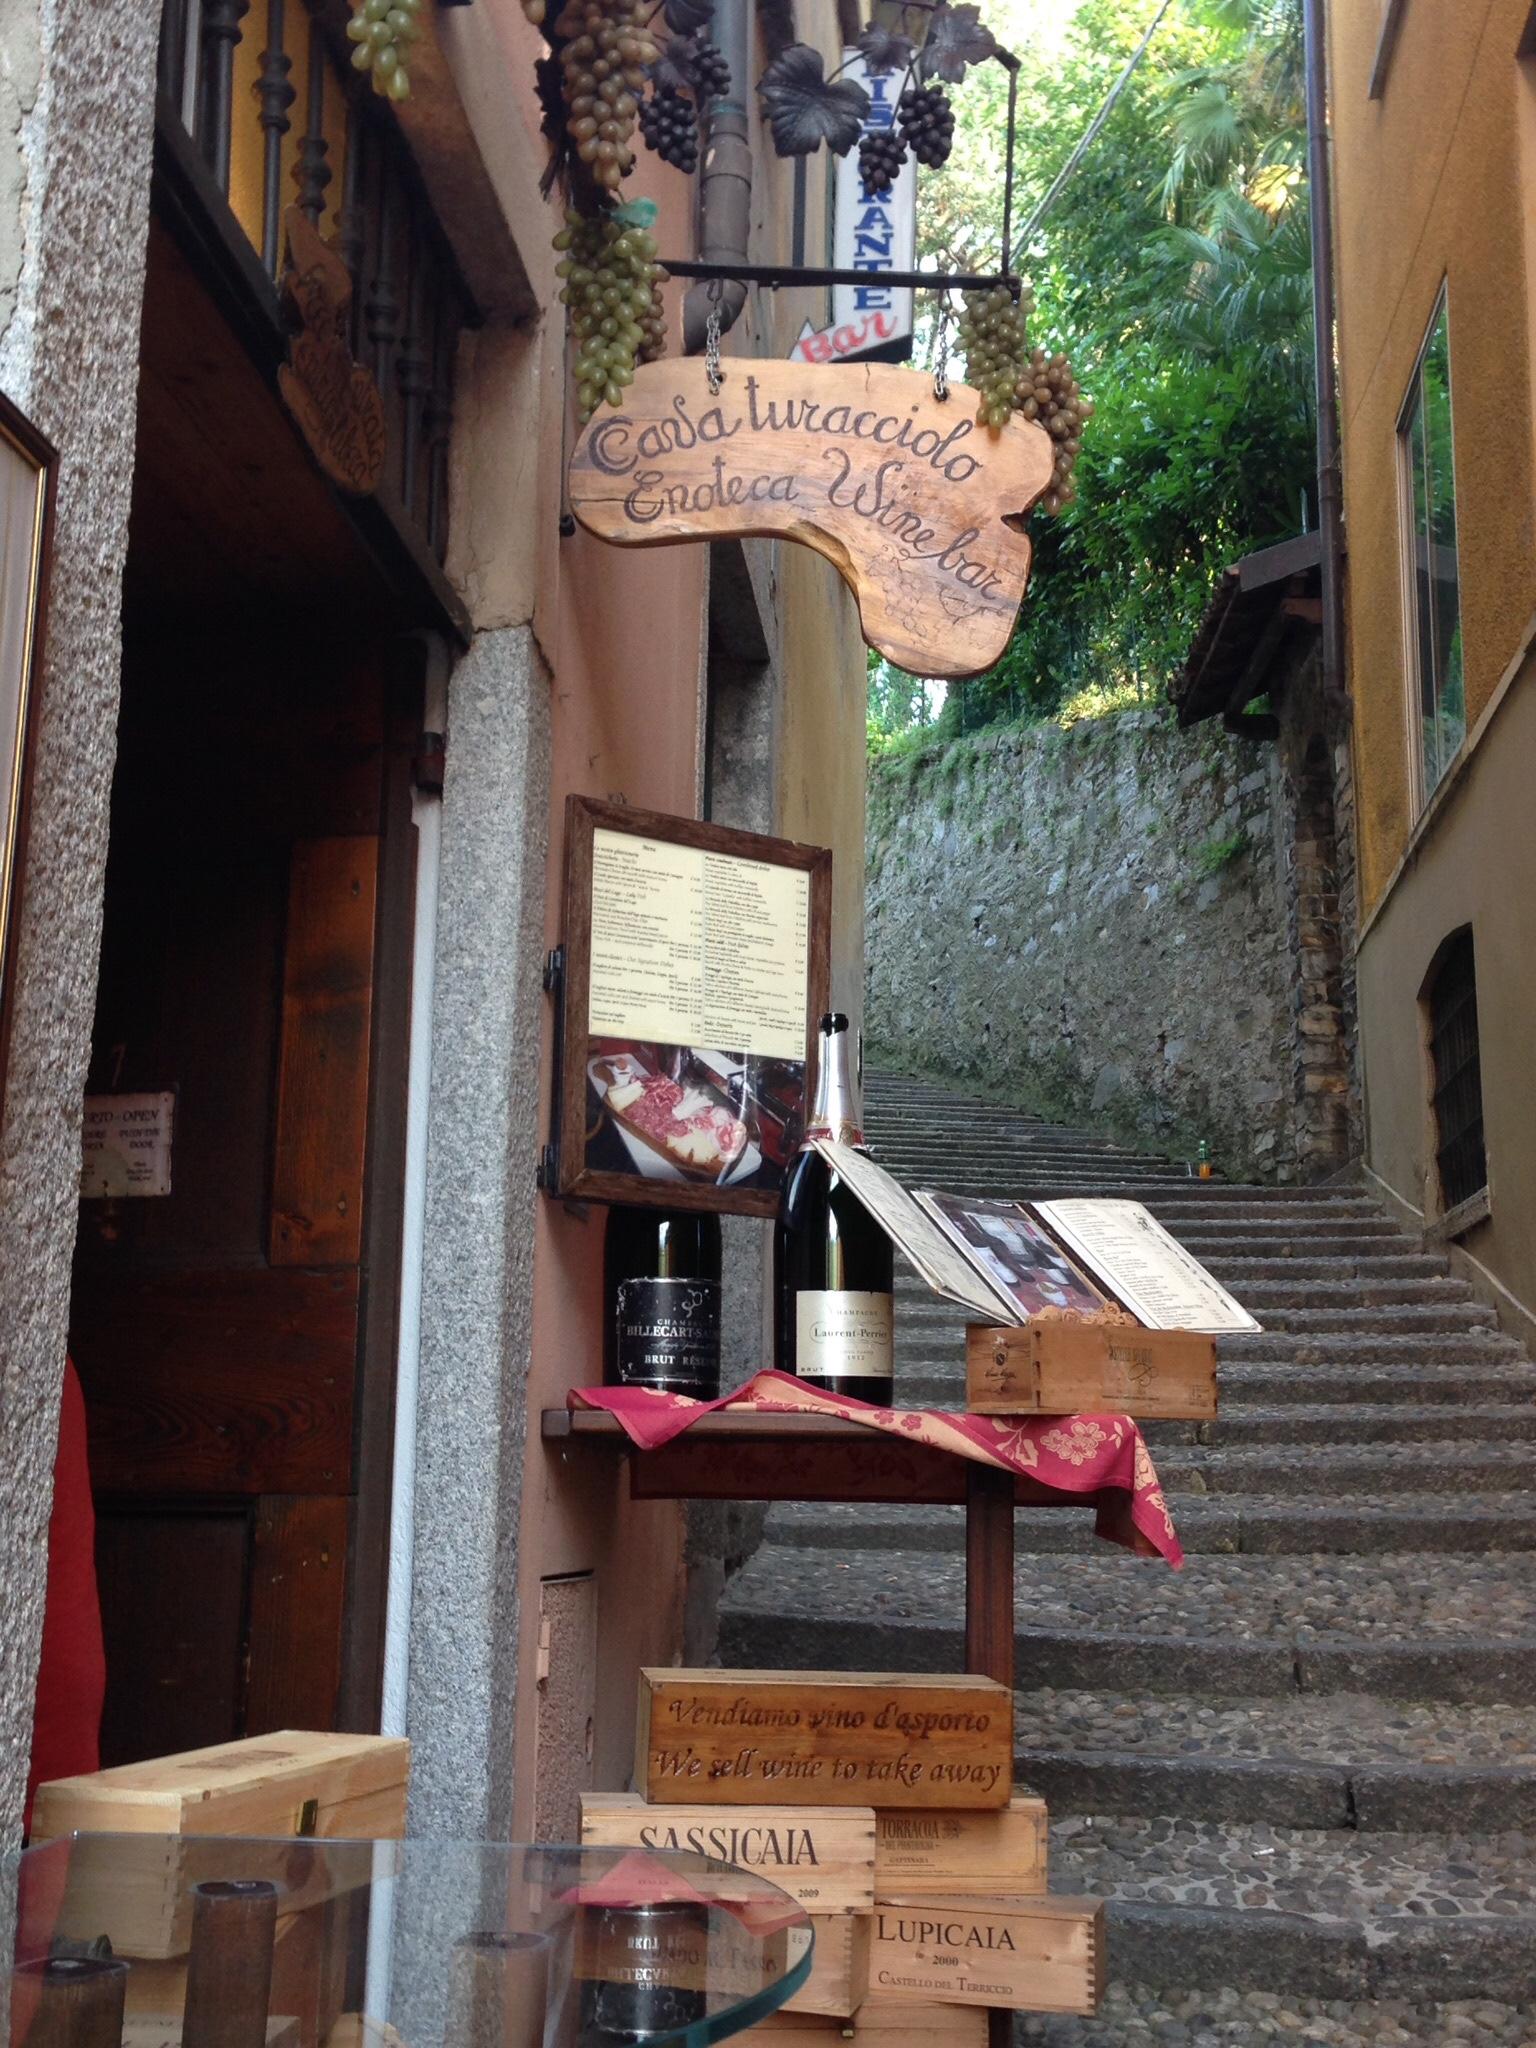 An enoteca (wine bar) in Bellagio, Lago di Como